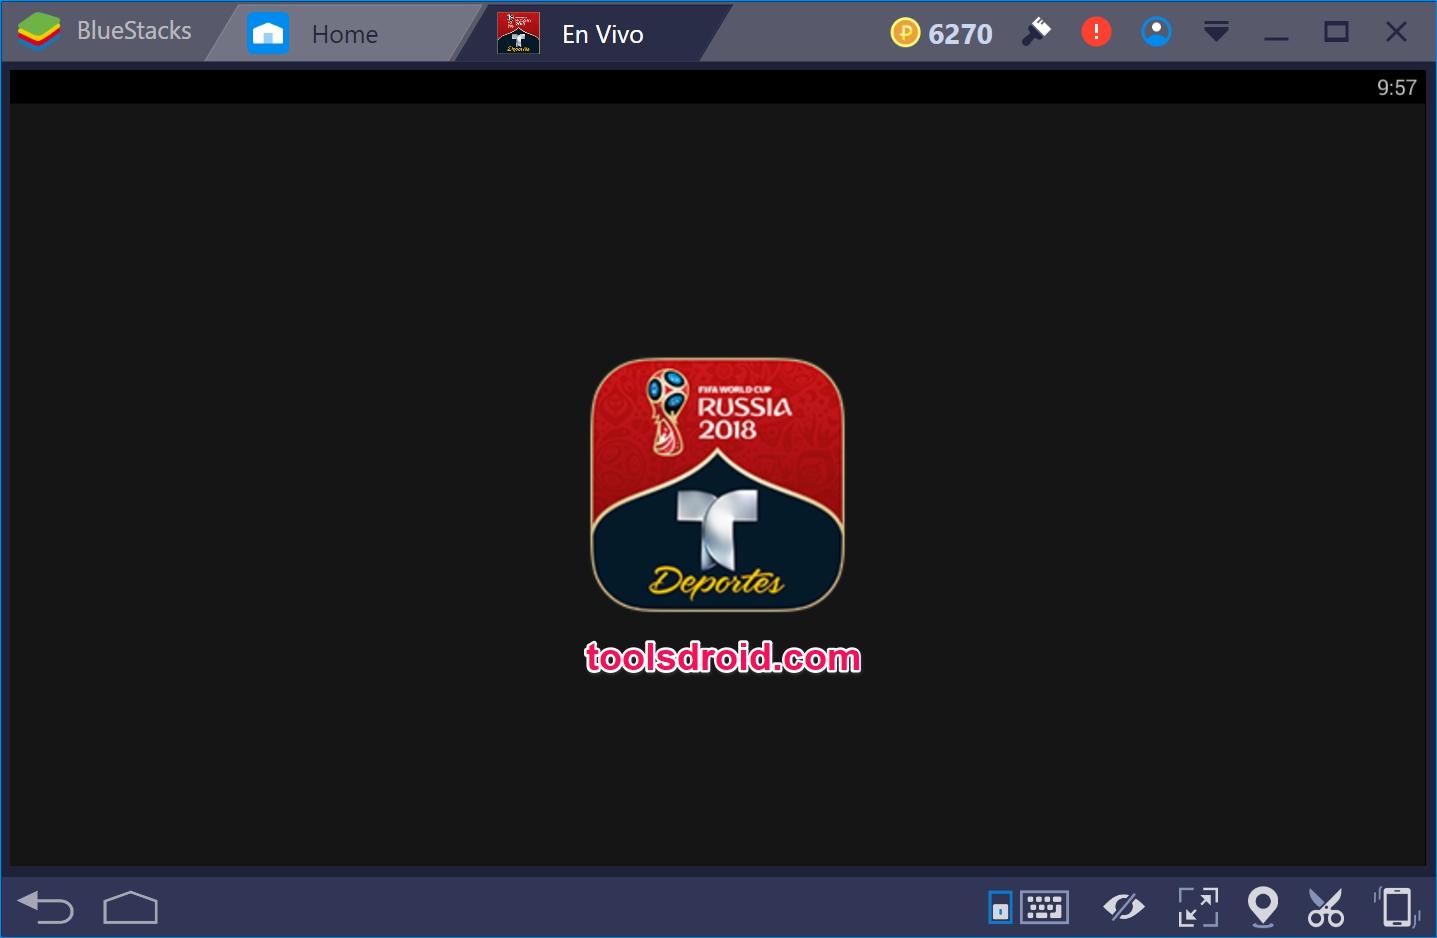 Telemundo Deportes - En Vivo for PC Laptop and Desktop